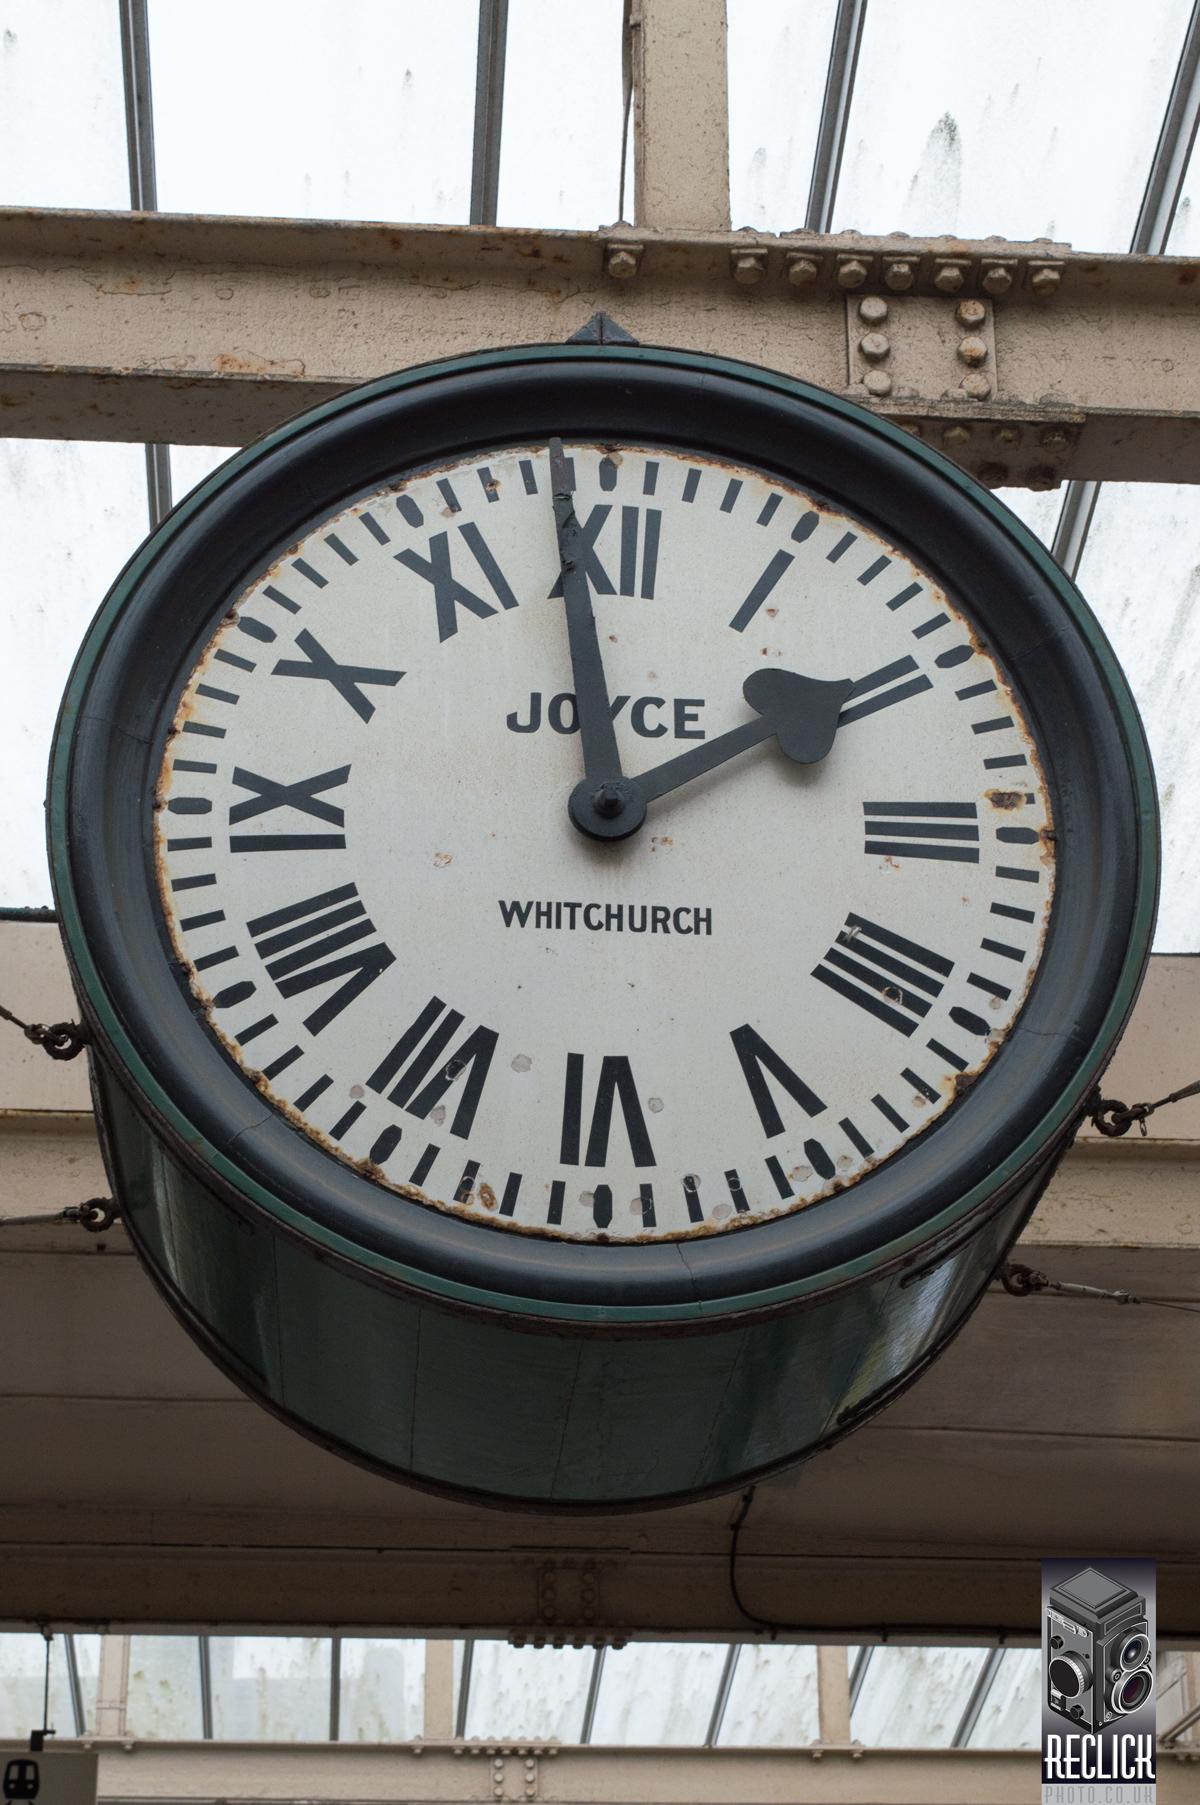 Carnforth Lancashire Railway Station clock ramp transport platform brief encounter film